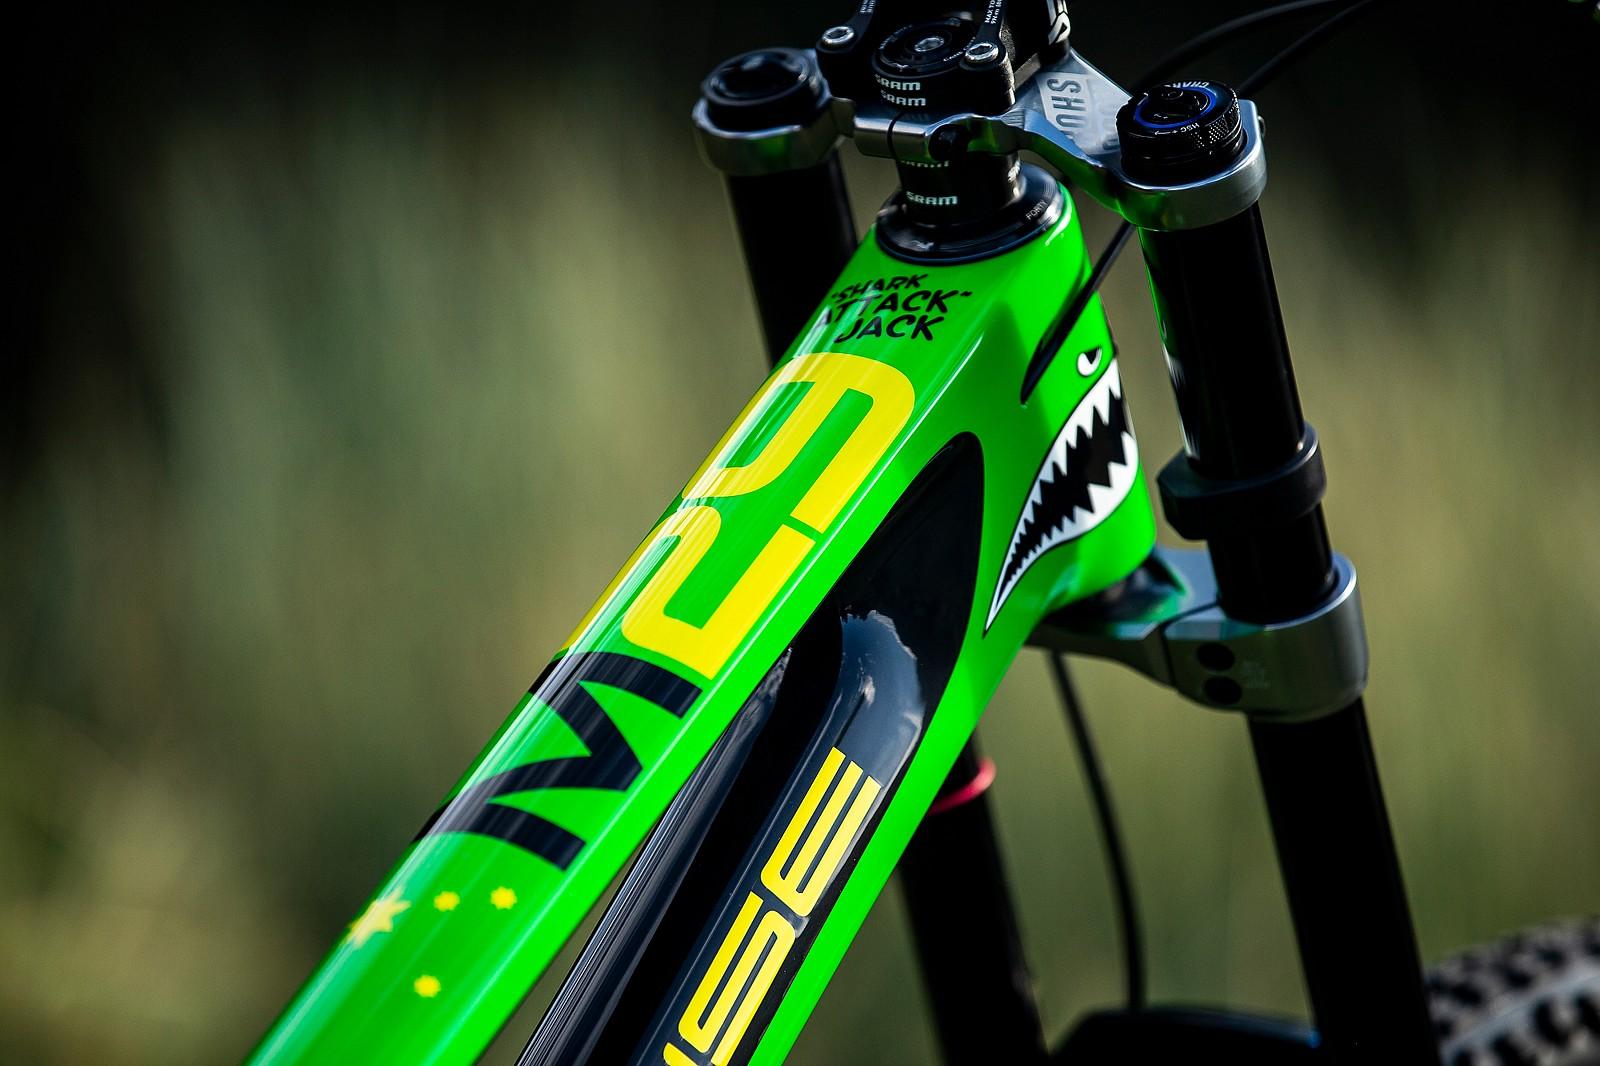 Some Like It Tall - WORLD CHAMPS BIKE - Jack Moir's Intense M29 - Mountain Biking Pictures - Vital MTB